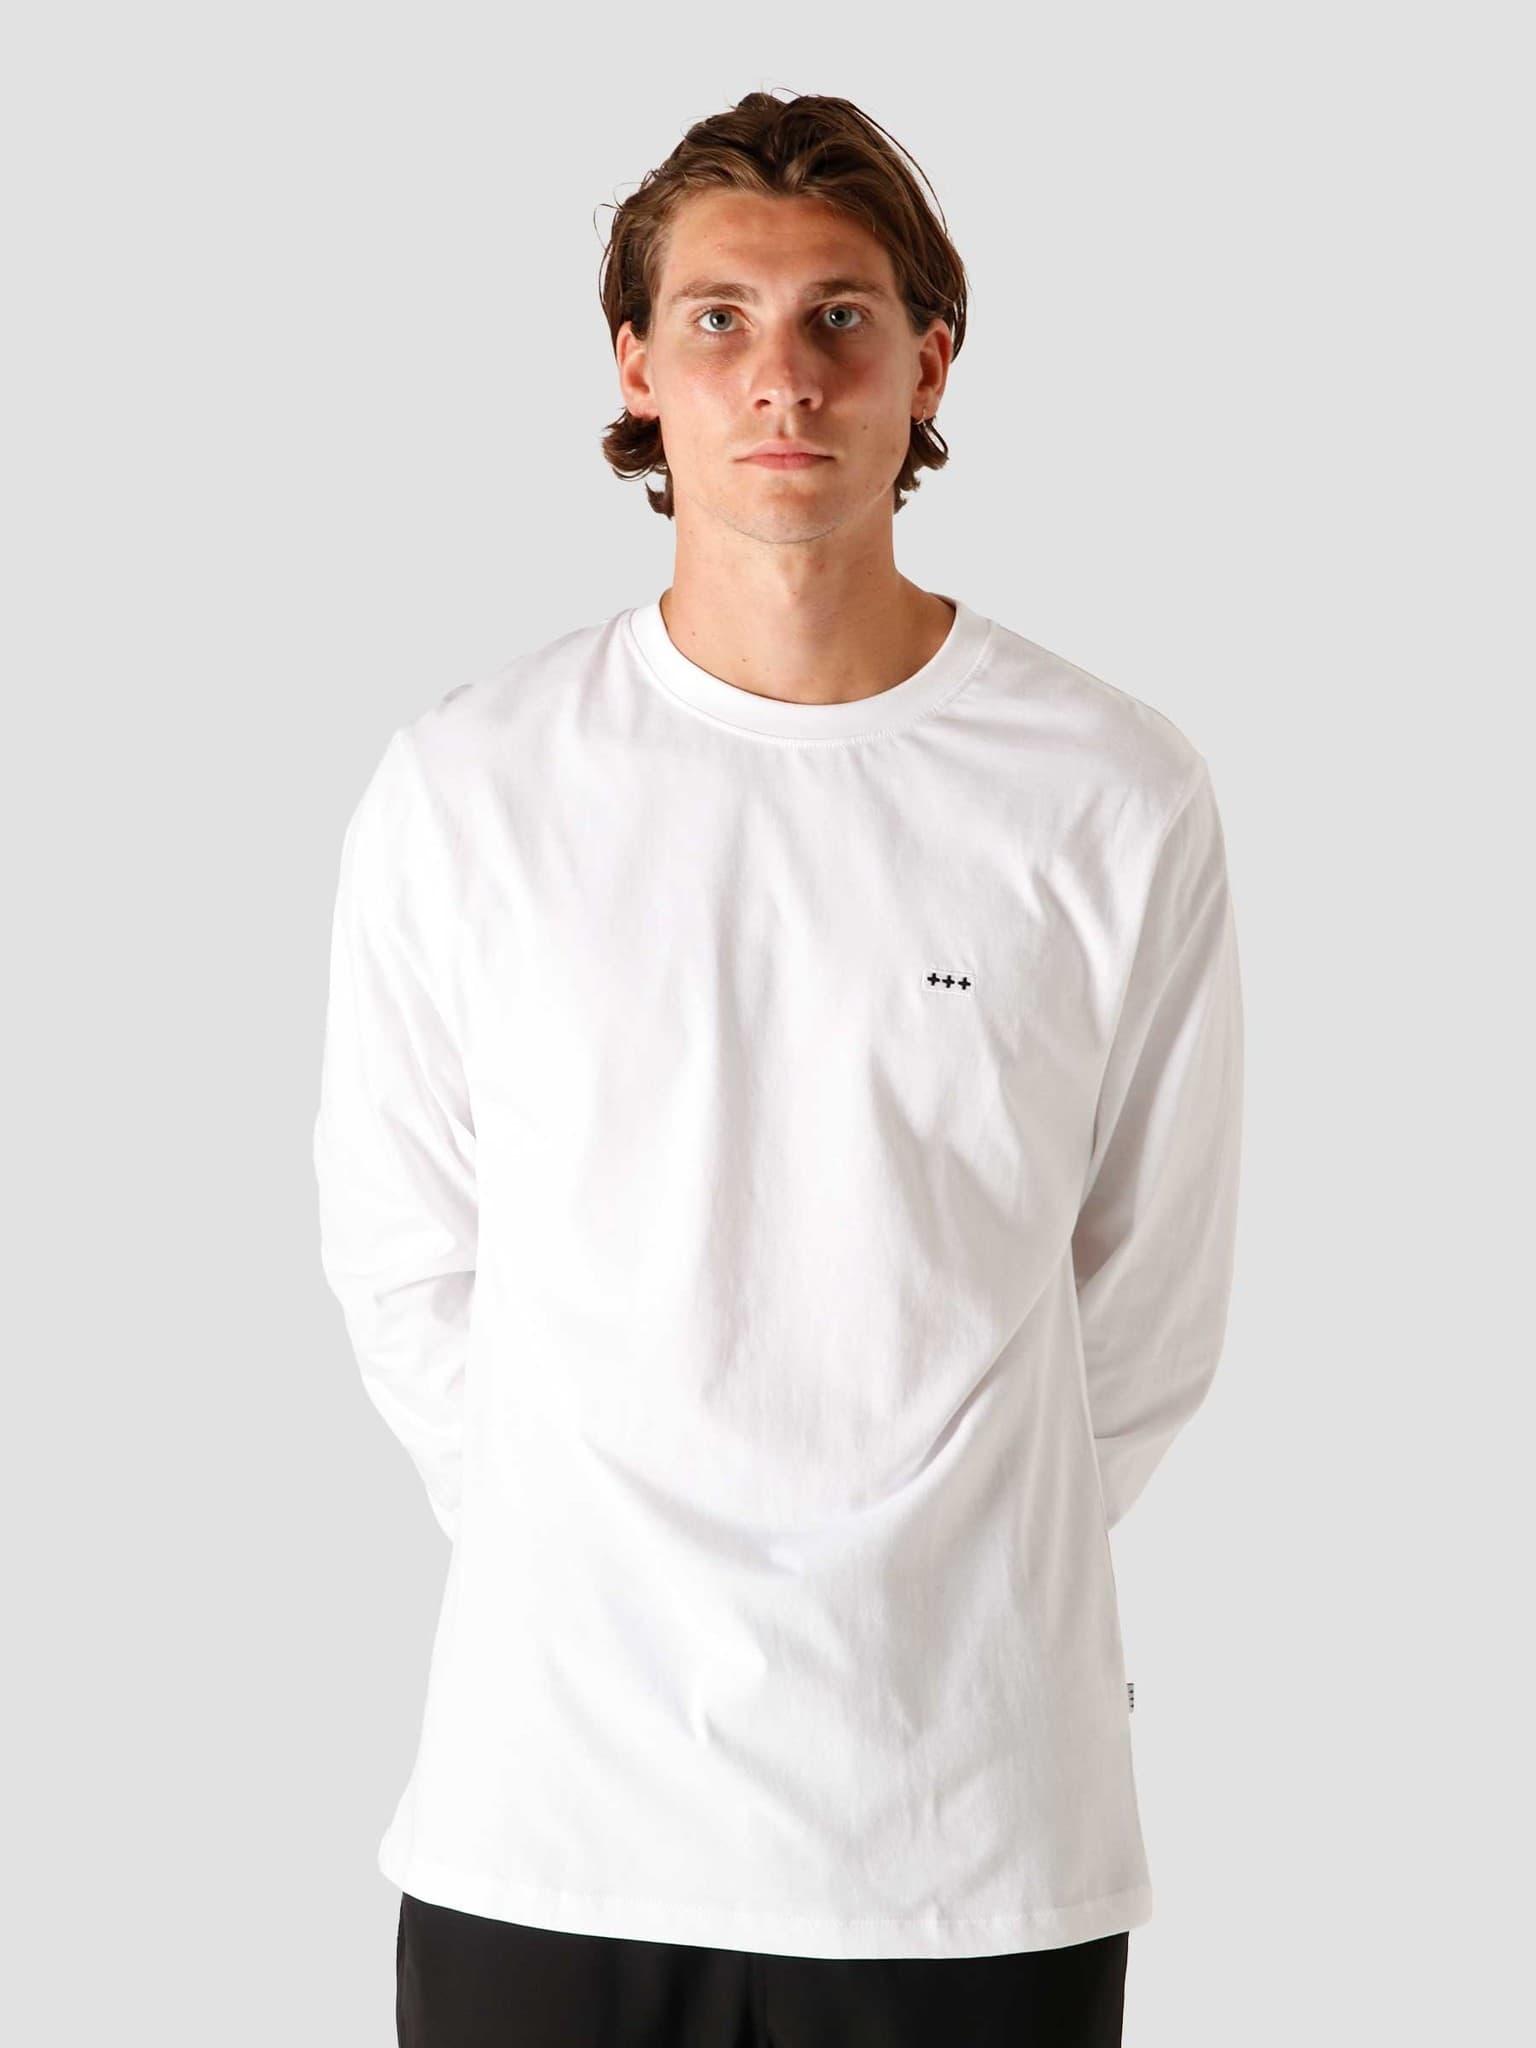 QB05 Patch Logo Longsleeve White